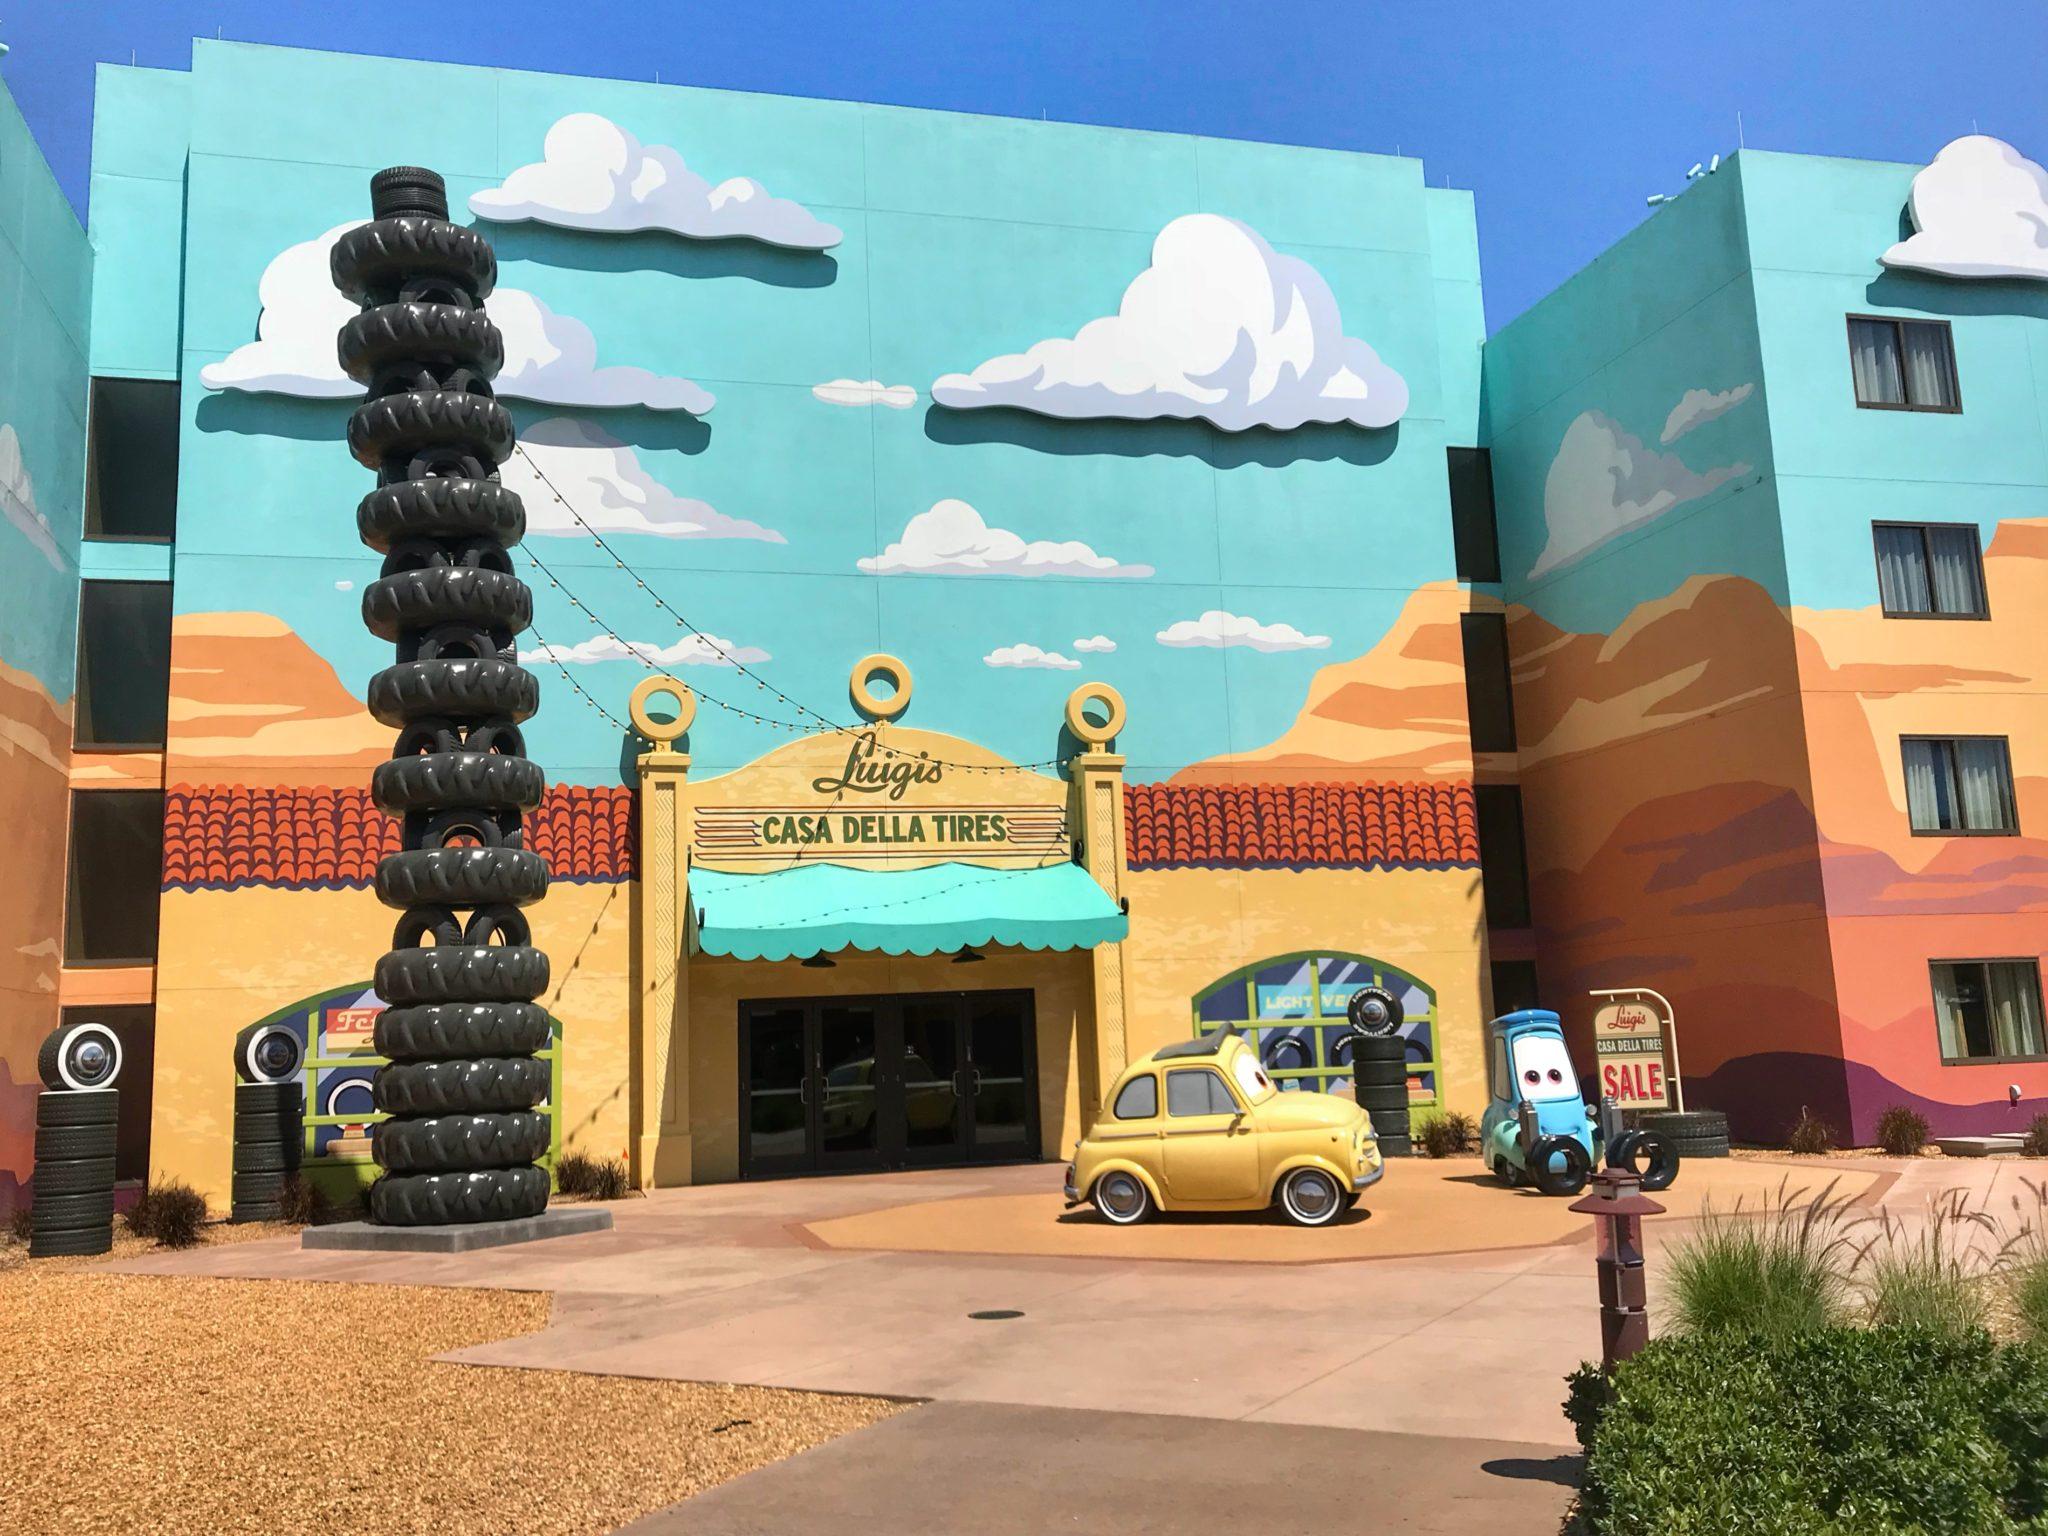 Walt Disney World's Art of Animation Resort